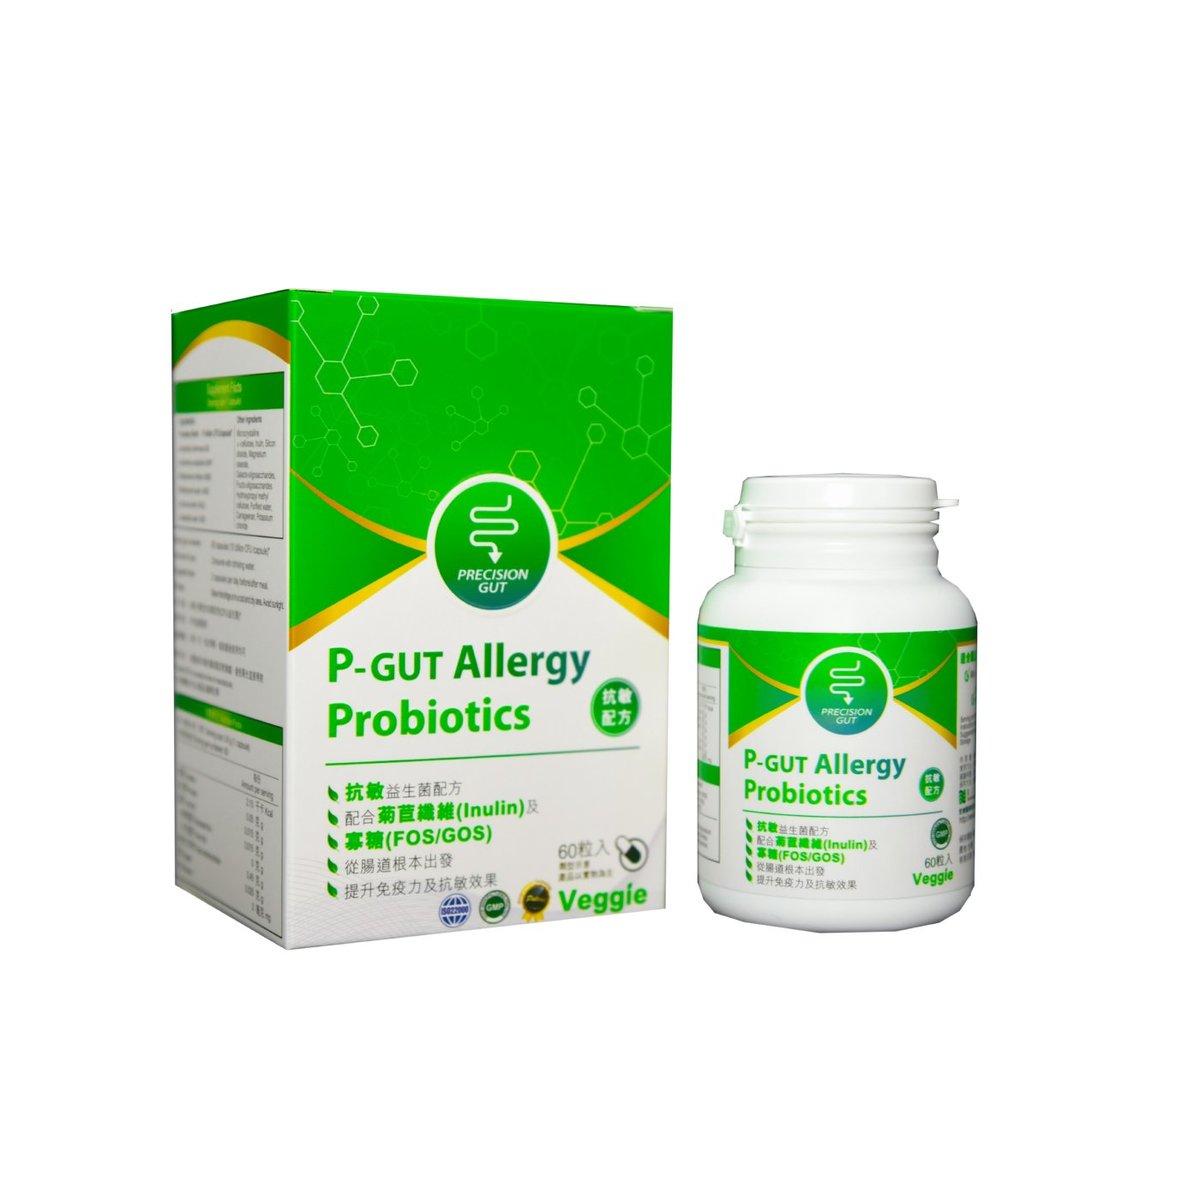 PGut Allergy Probiotics